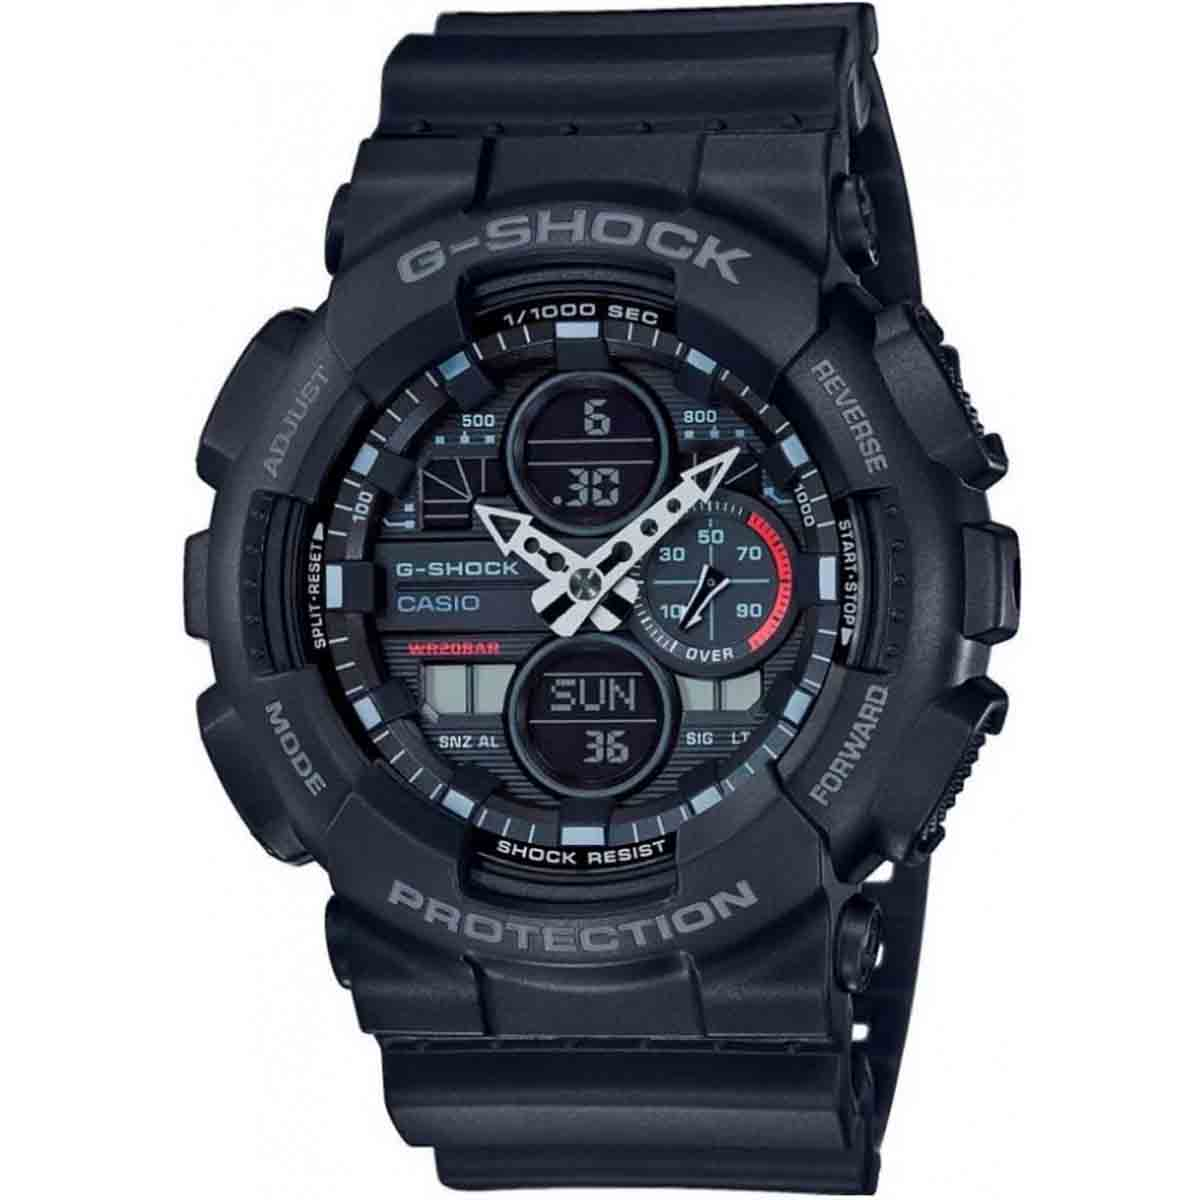 Relógio Casio G-Shock Anadigi Masculino GA-140-1A1DR